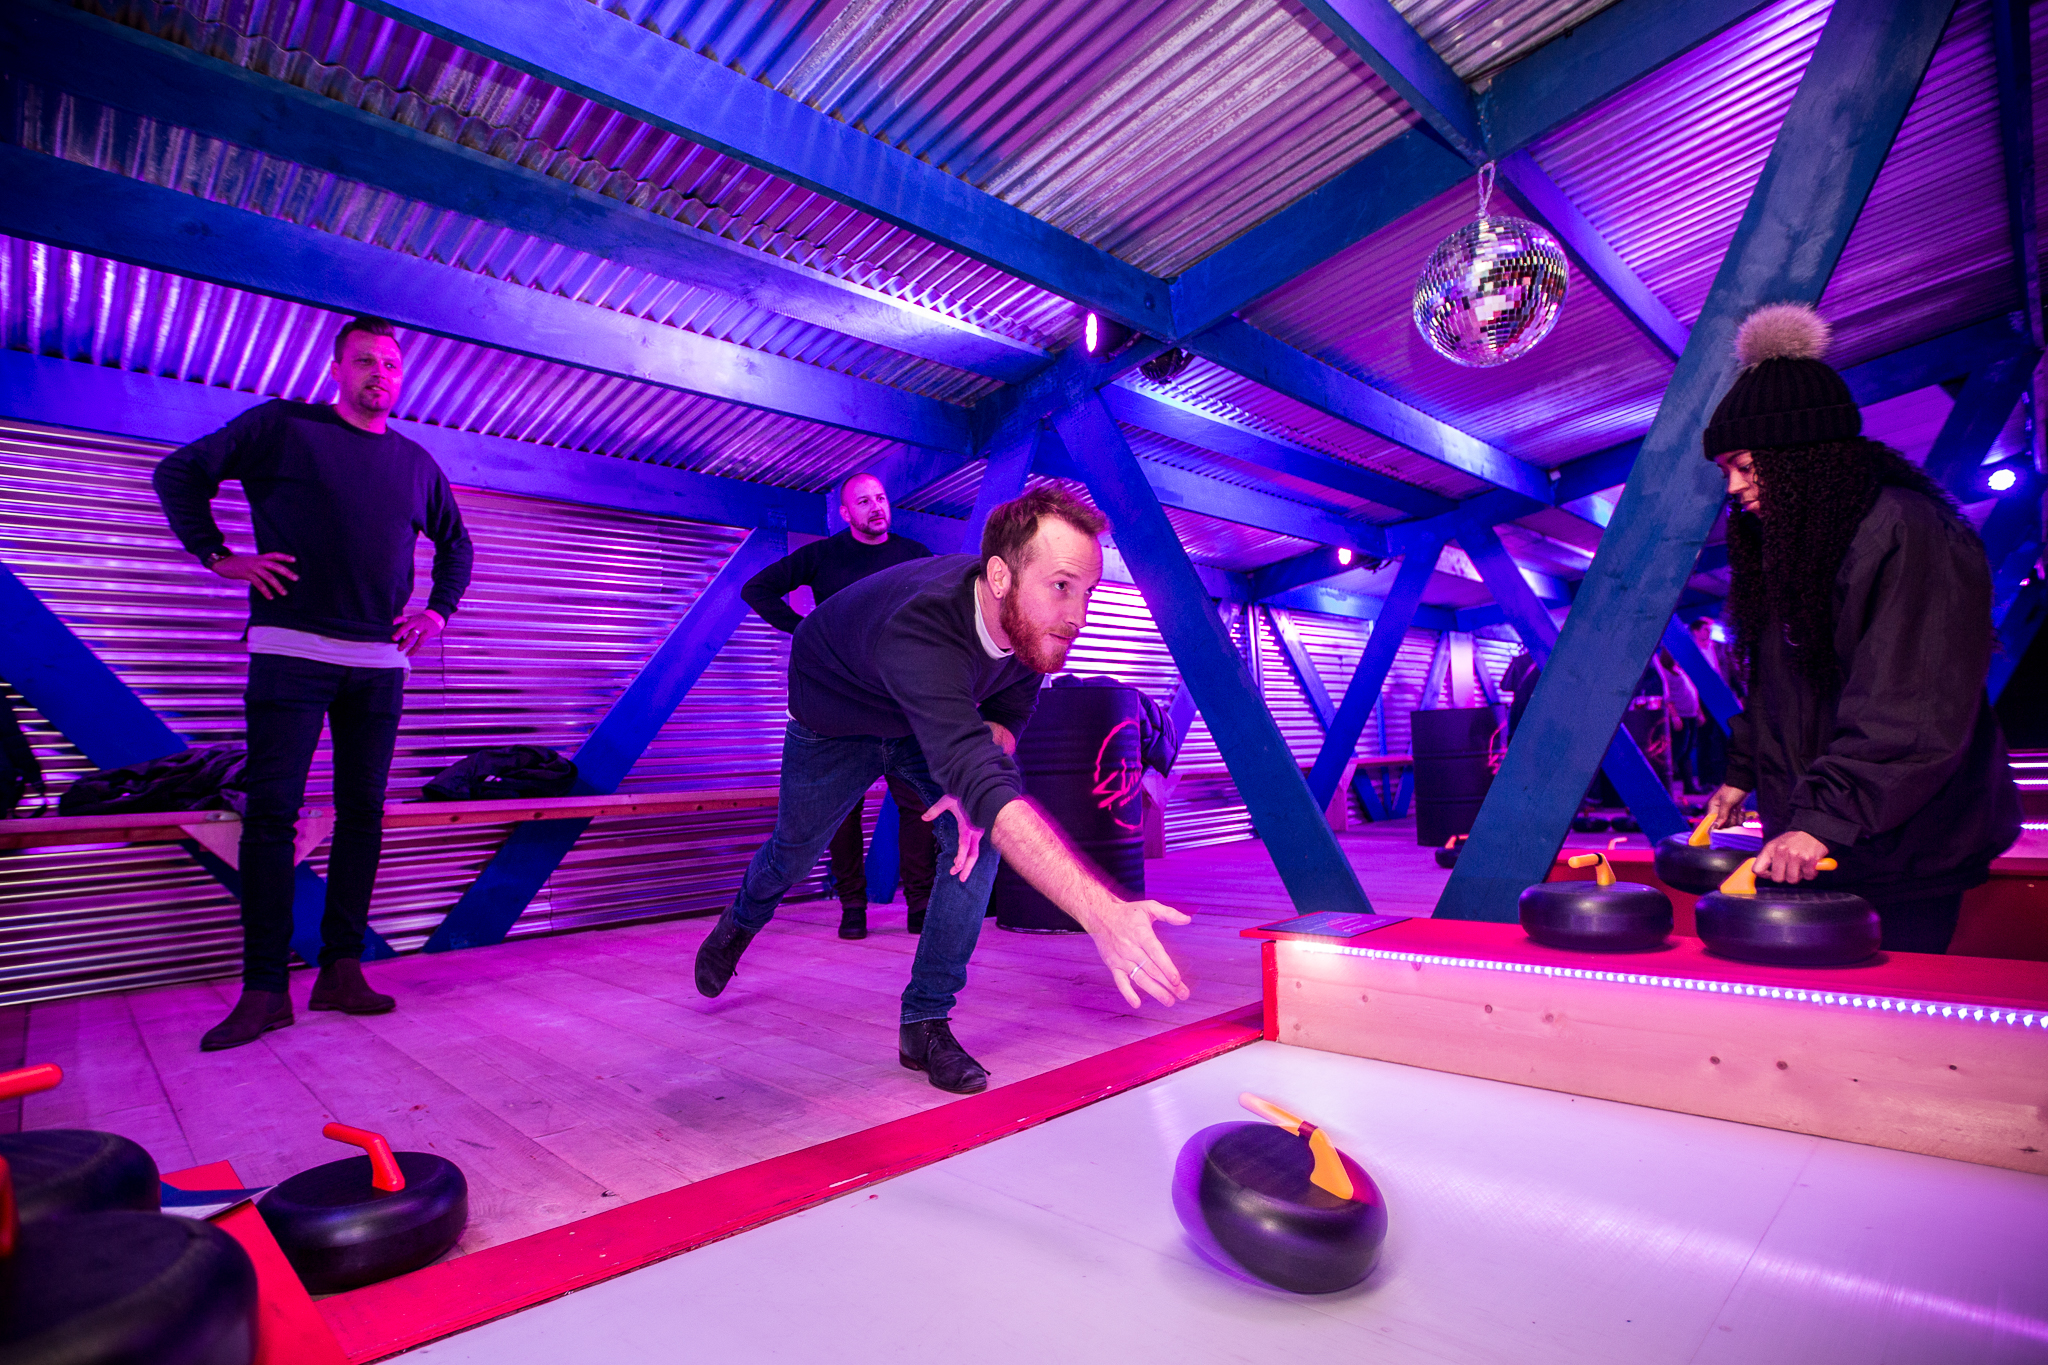 Last Chance: Social Fun & Games Club brings igloos and